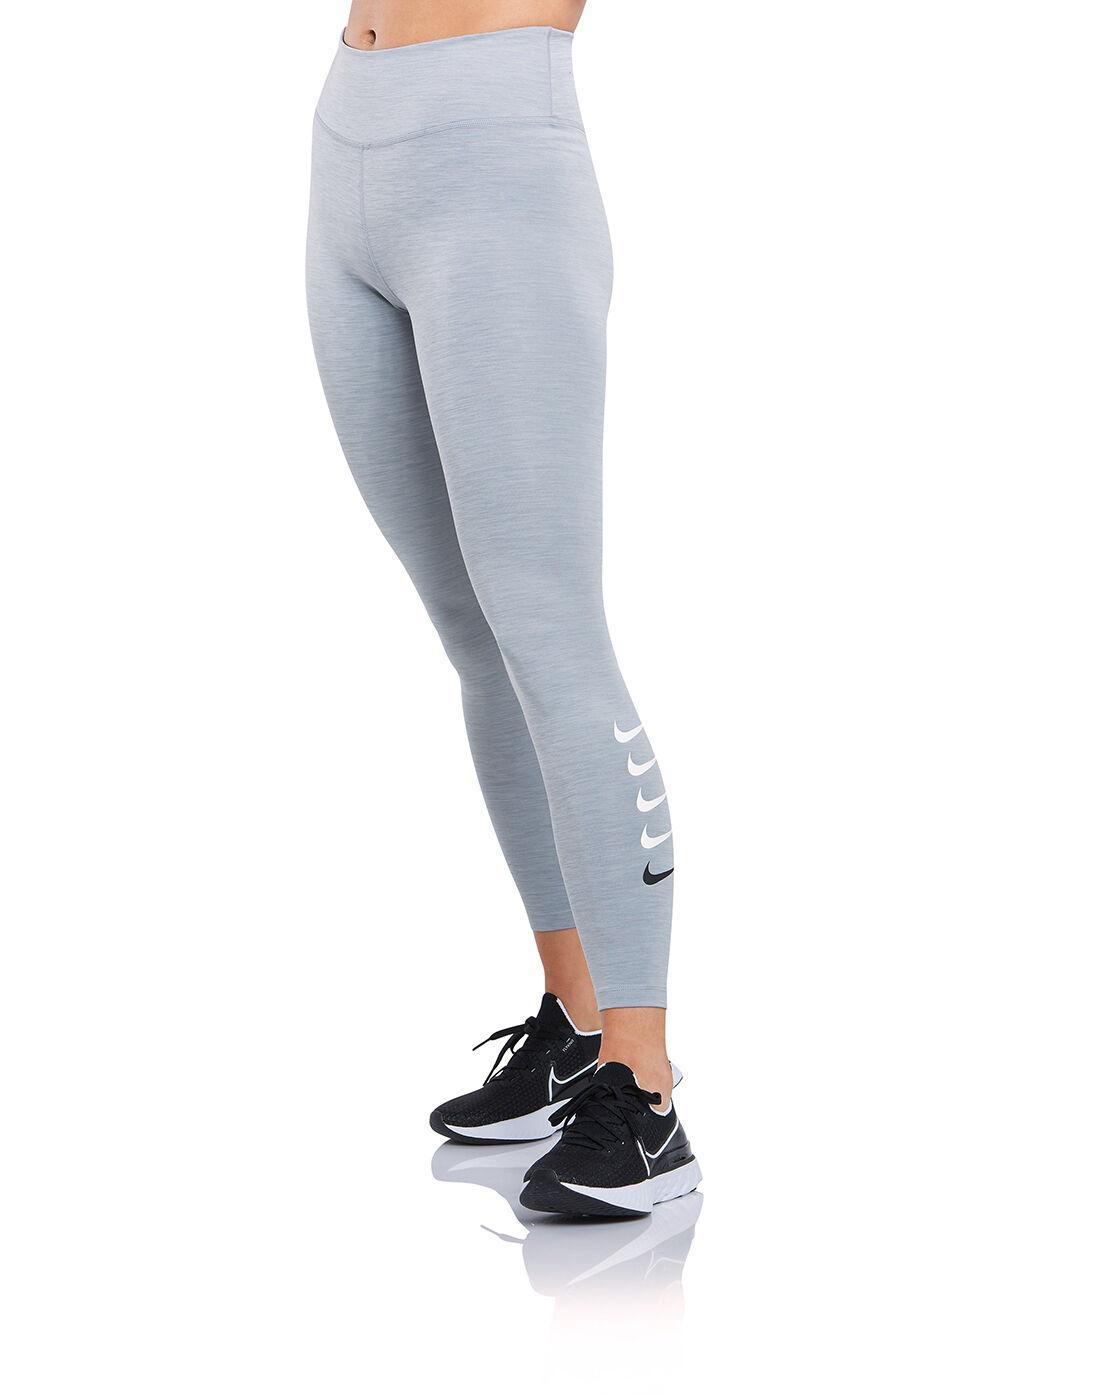 Nike Womens Swoosh Run Leggings - Grey